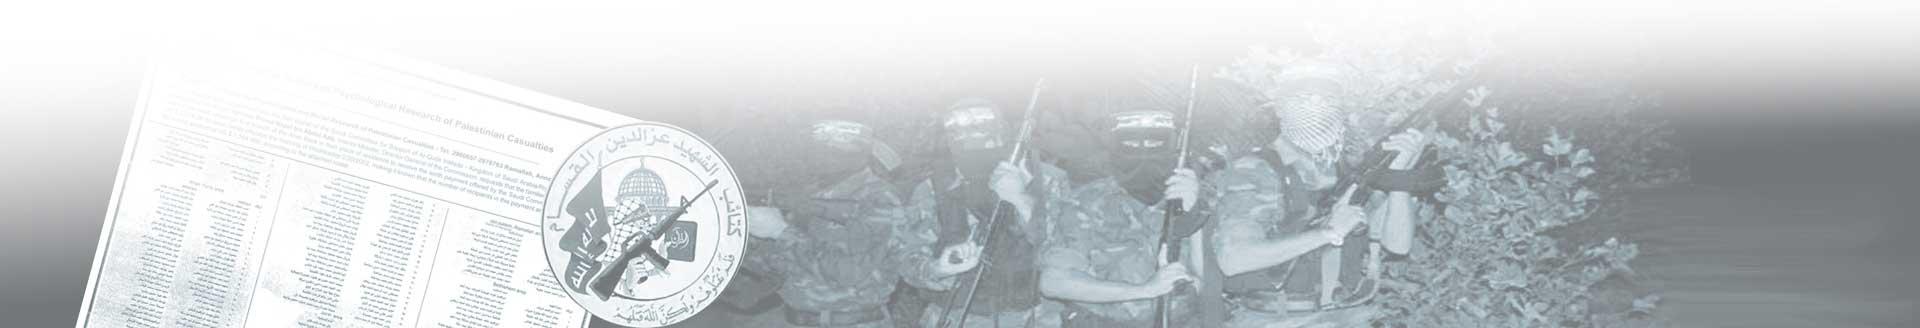 Linde v. Arab Bank, Plc - The 24 Hamas Attacks - Osen LLC